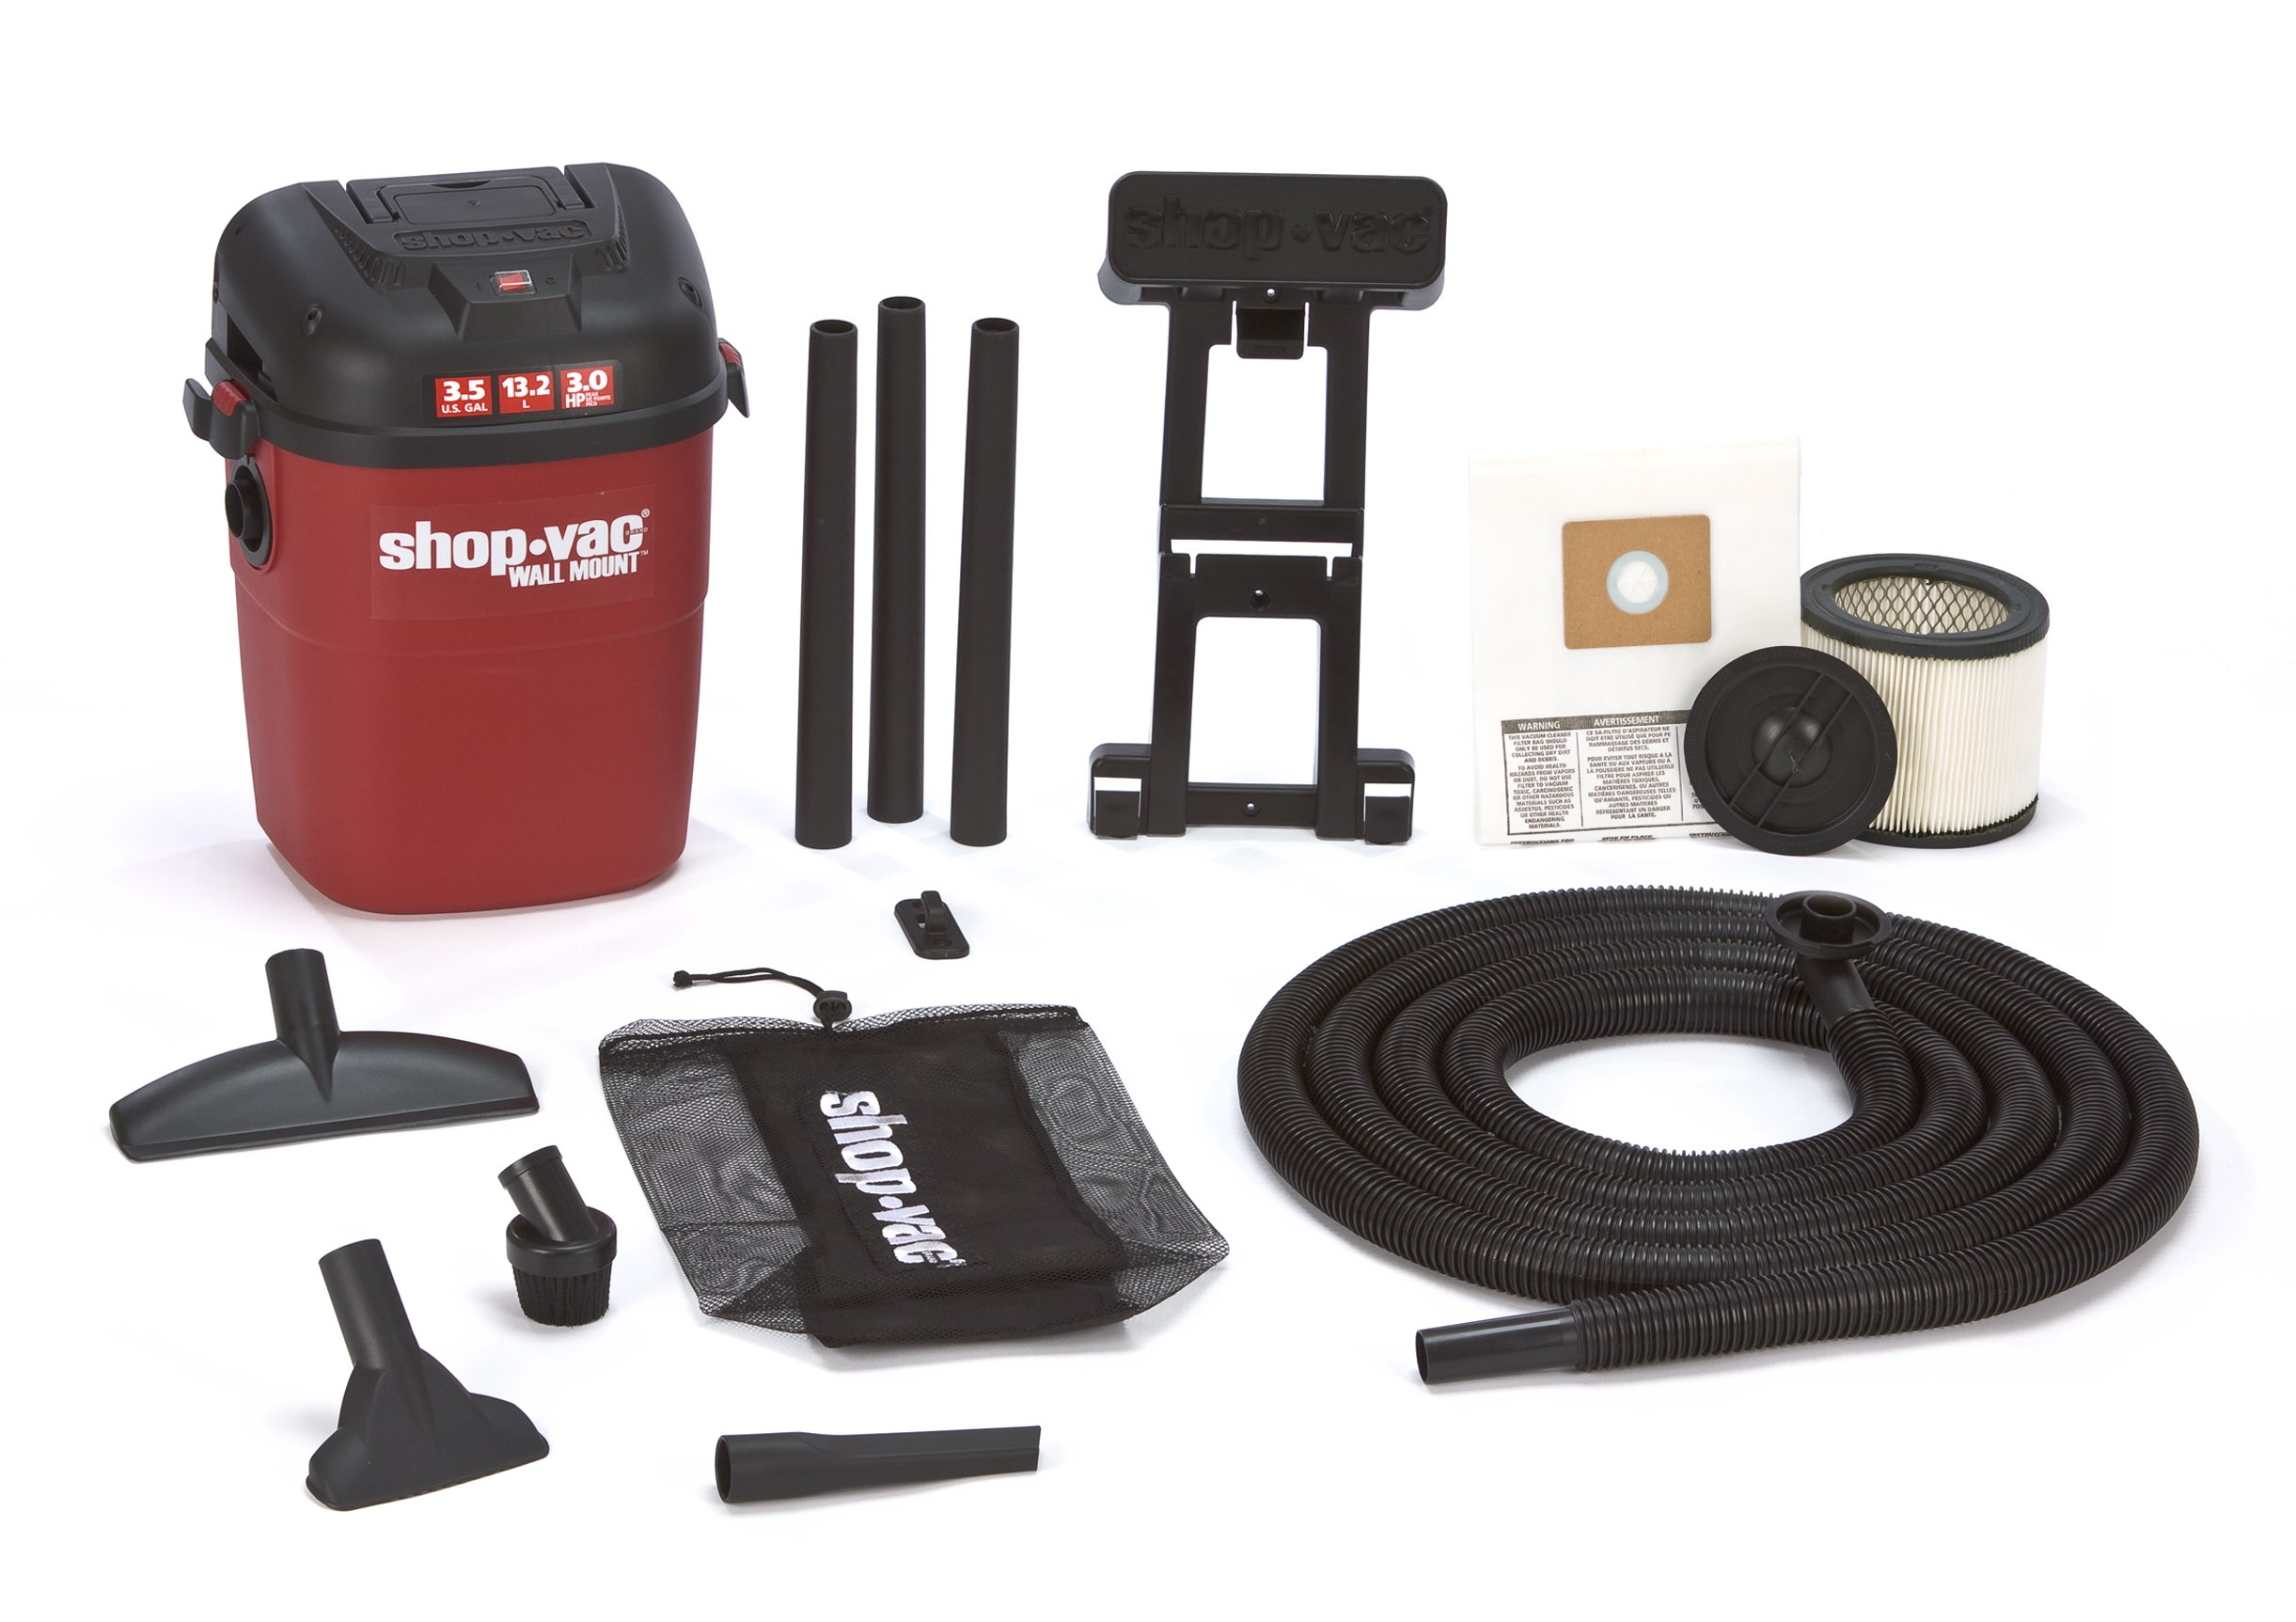 Shop-Vac 3940100 3.5-Gallon 3.0-Peak HP Wall Mount Wet/Dry Vacuum by Shop-Vac